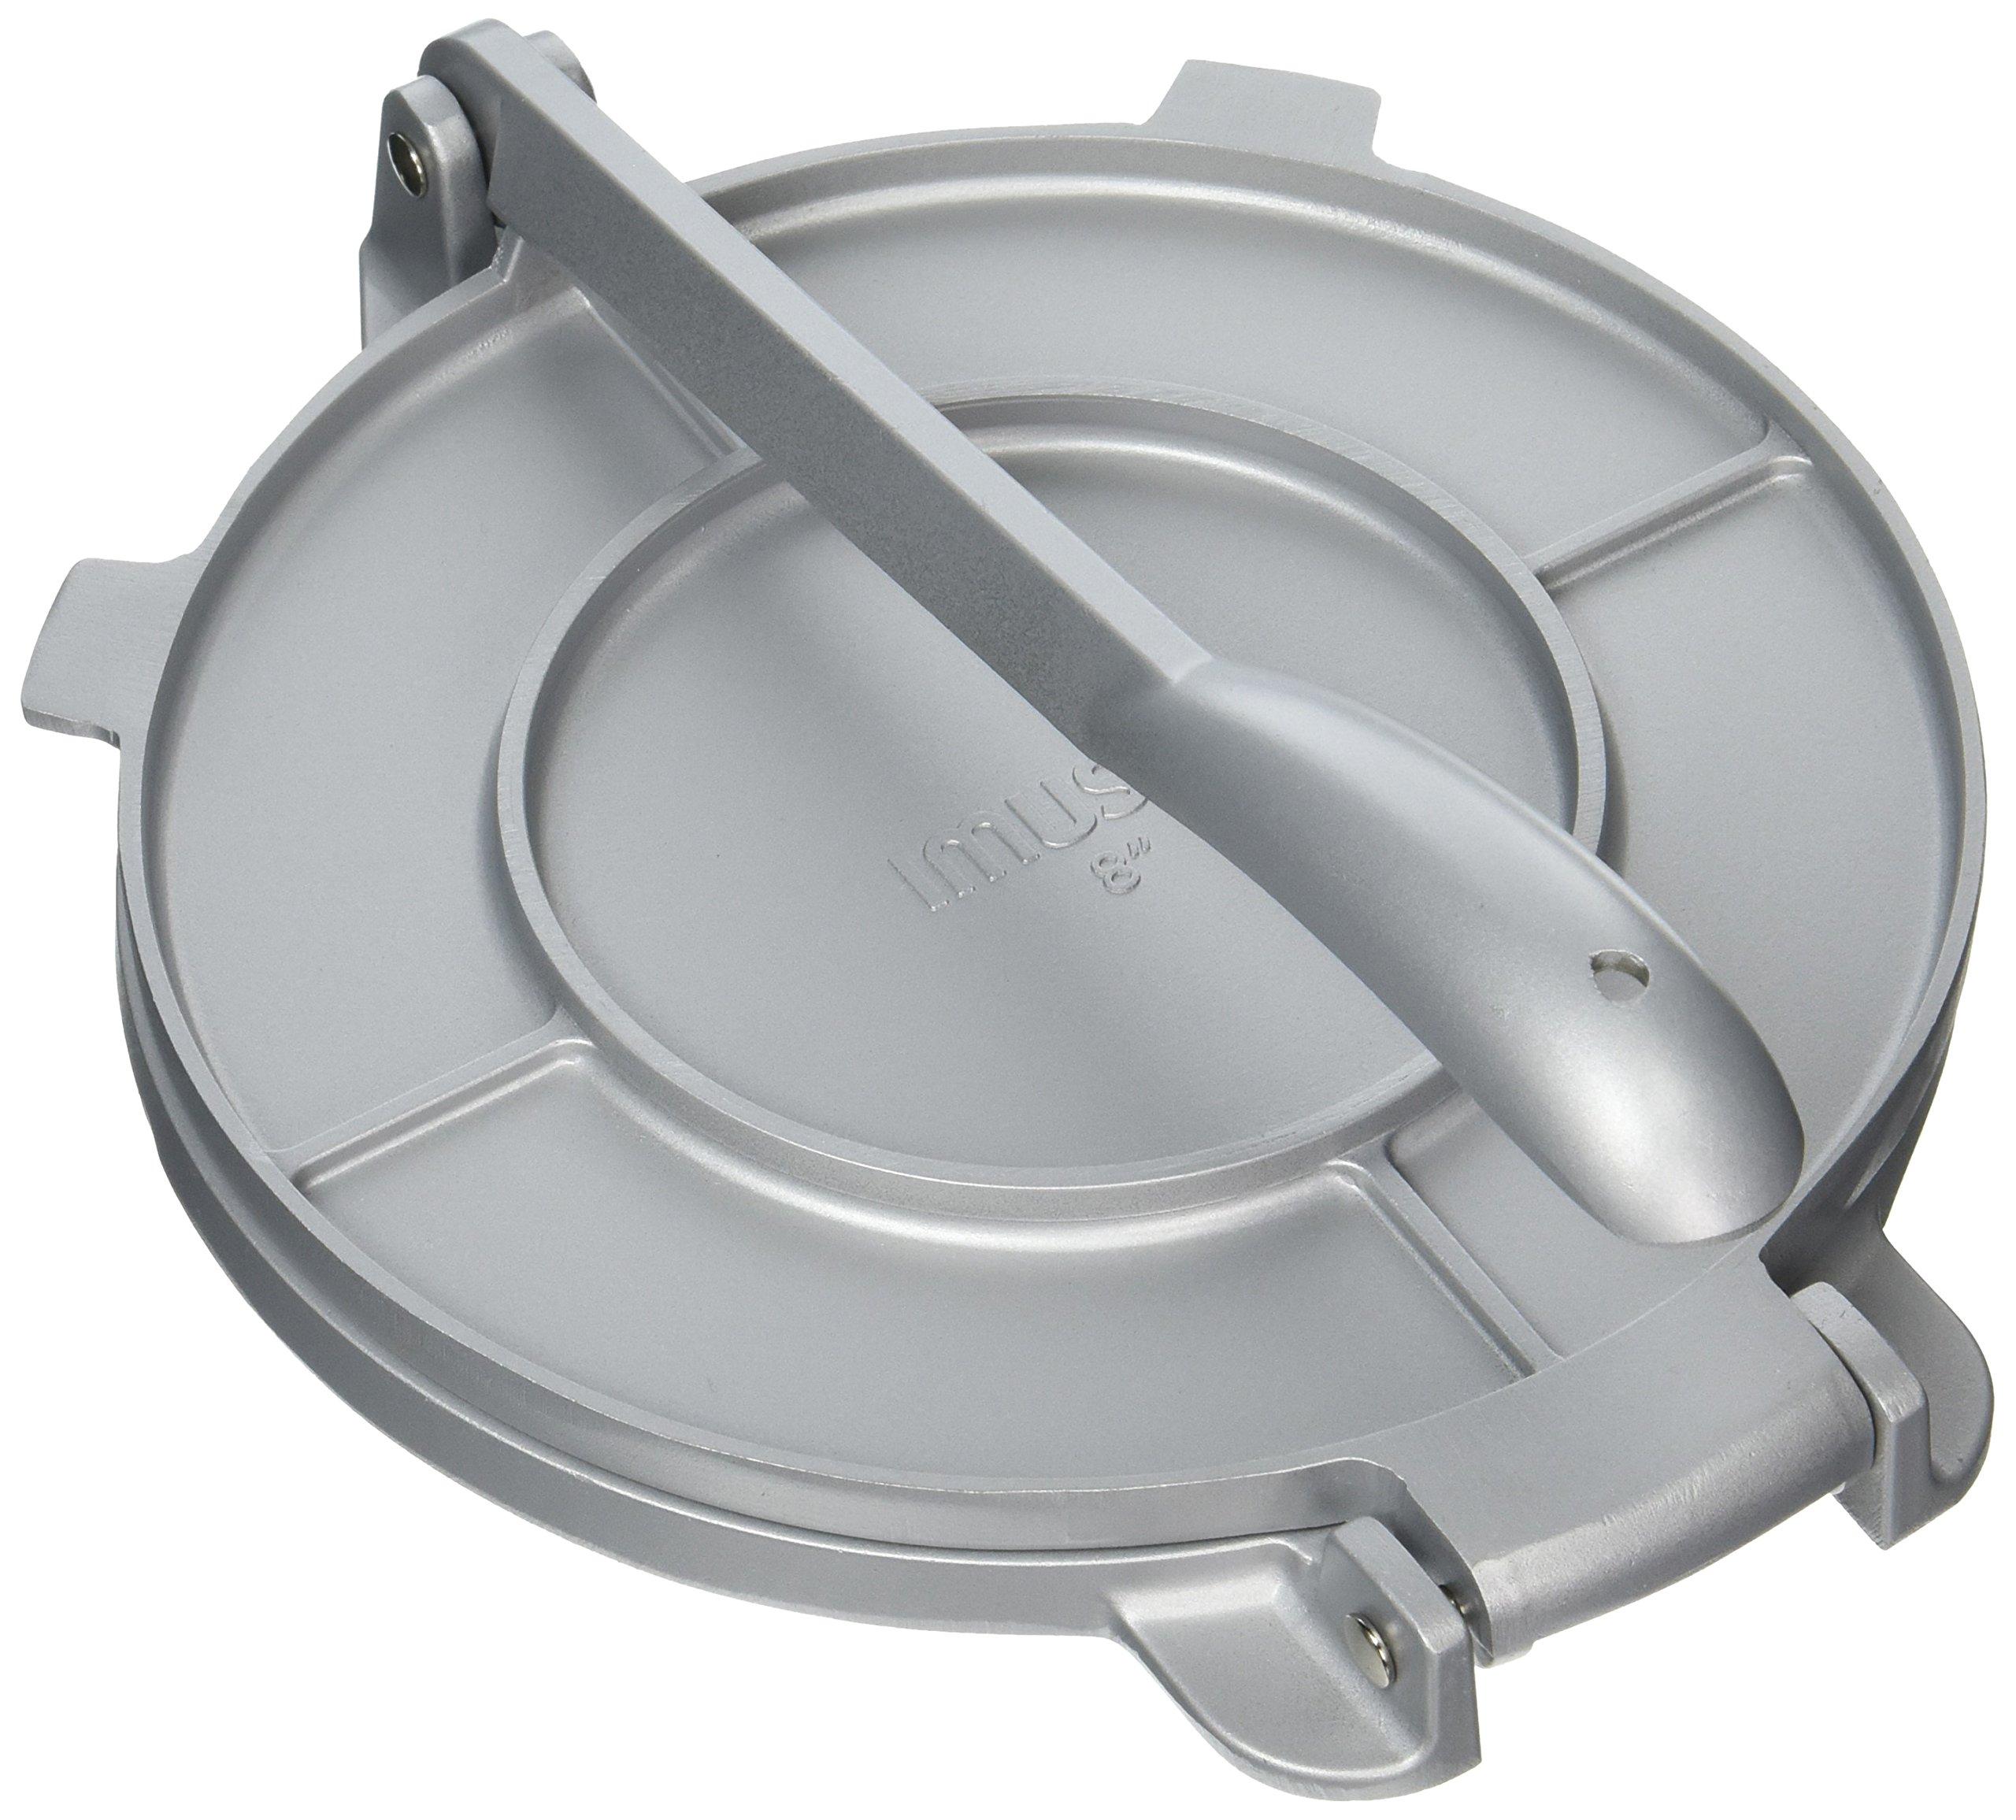 IMUSA USA MEXI-86009M Cast Aluminum Tortilla & Roti Press 8-Inch, Silver by Imusa